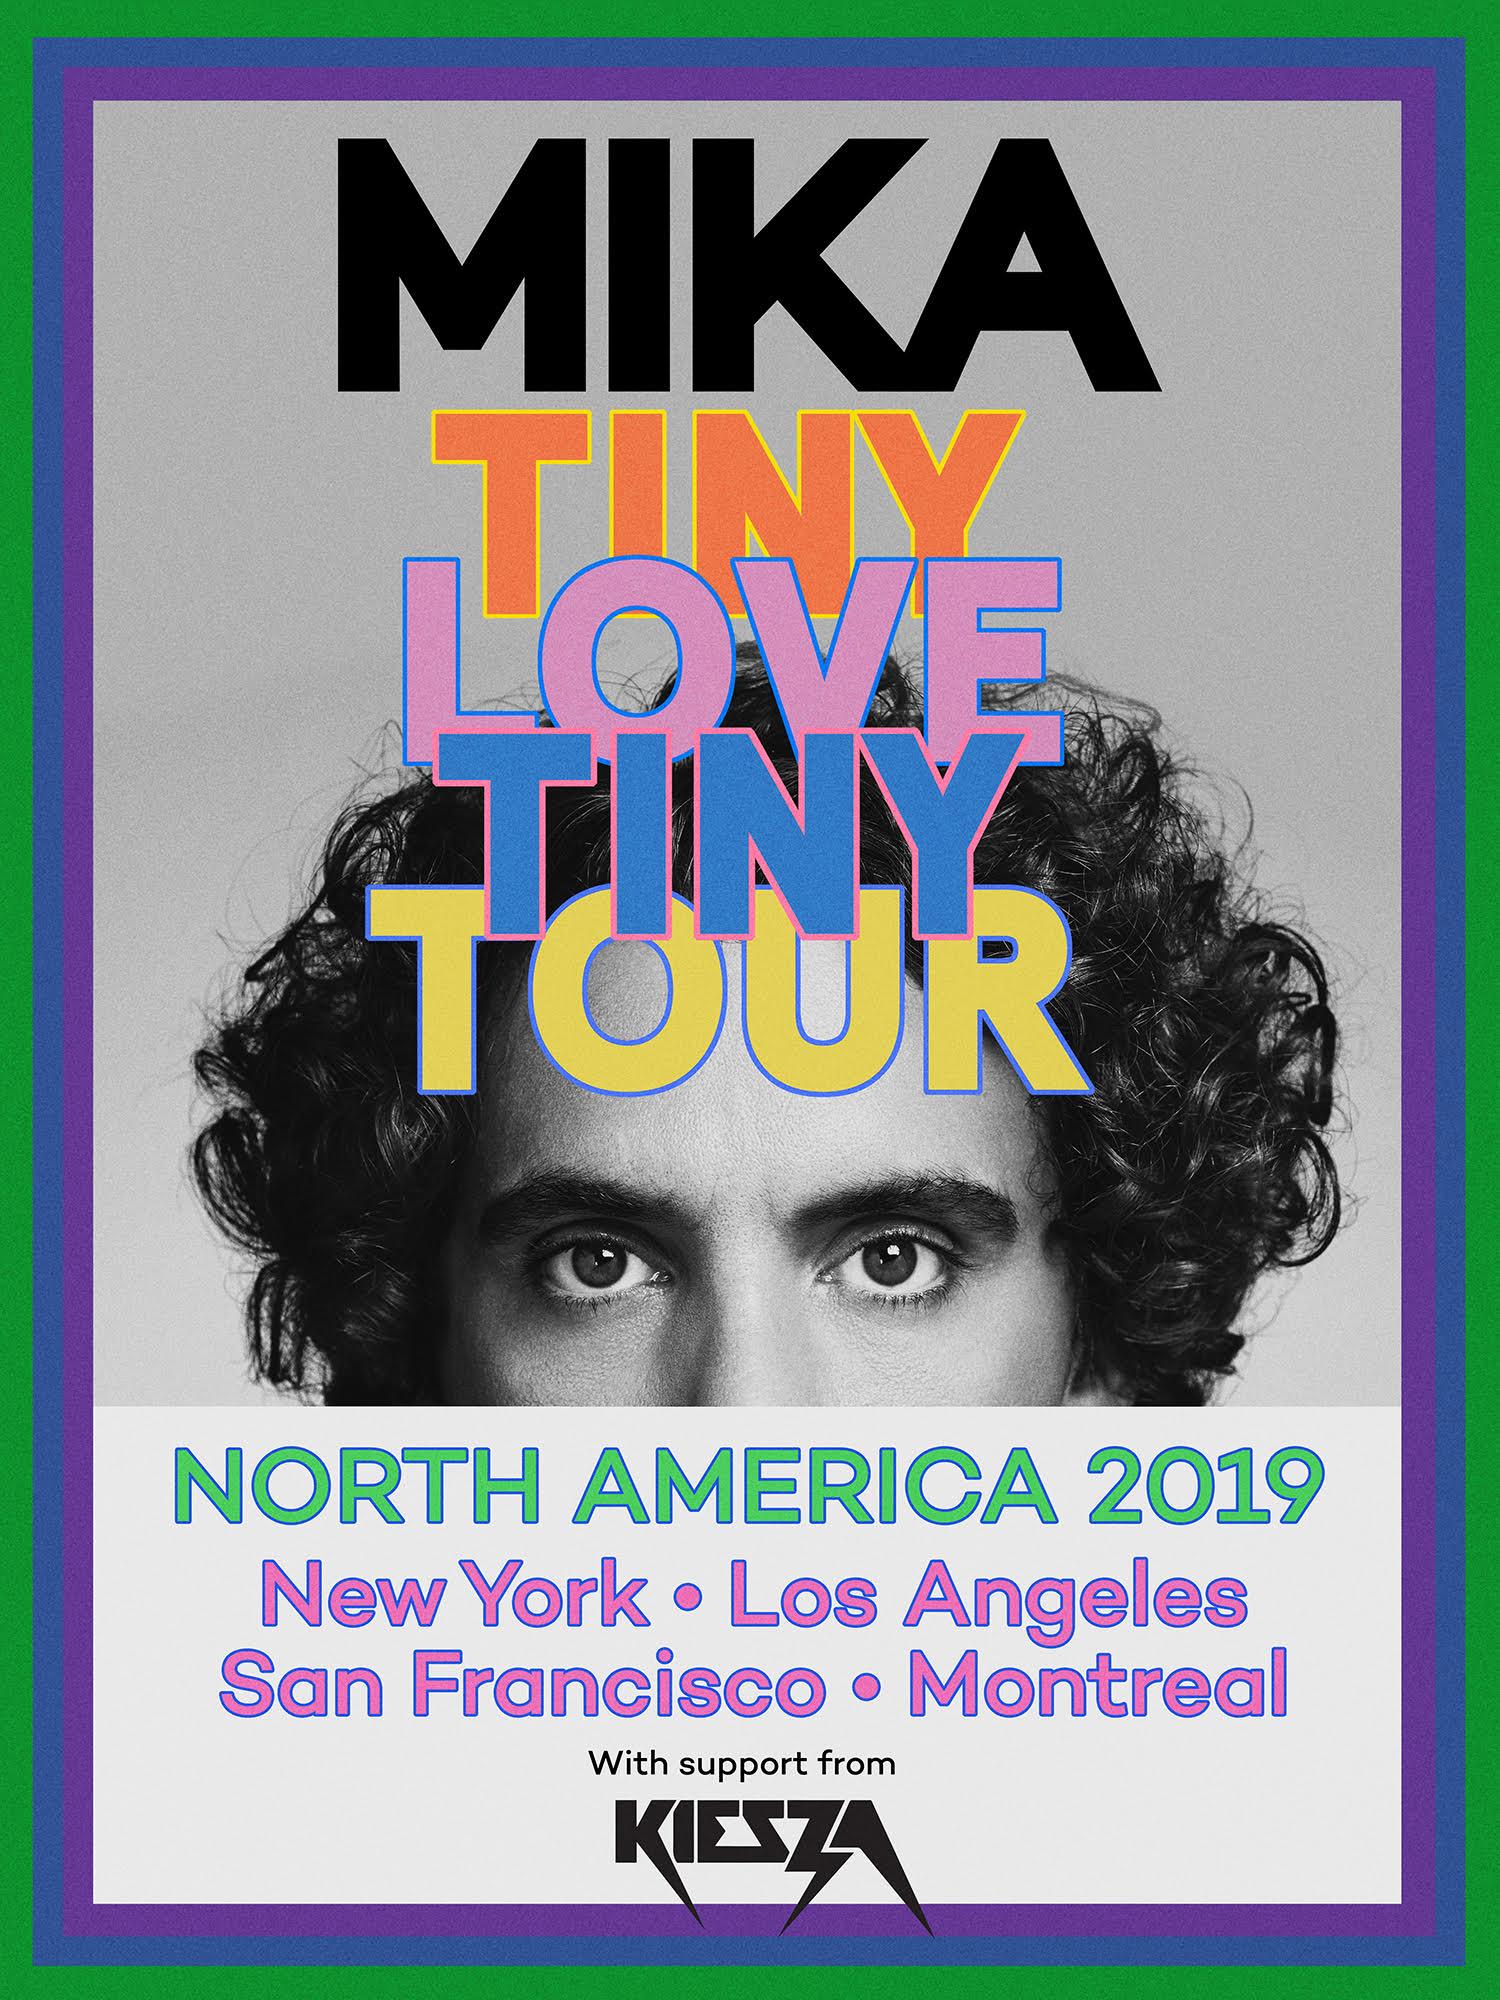 9/12/19   New York, NY   Brooklyn Steel   https://www.axs.com/events/378826/mika-tickets   9/13/19   New York, NY   Brooklyn Steel   http://axs.com/events/378465/mika-tickets?skin=brooklynsteel   9/15/19   Montreal, QC, CAN   Corona Theatre   https://tickets.evenko.ca/shop/?locale=en-CA&skin=corona&fac=EVENKO#a0fec749-86ff-4516-a5e6-7d34c2b39843   9/16/19   Montreal, QC, CAN   Corona Theatre   https://tickets.evenko.ca/shop/?locale=en-CA&skin=corona&fac=EVENKO#5e7ead40-3bf2-4021-8e96-29241c1b324b   9/18/19   San Francisco, CA   The Fillmore   https://www.ticketmaster.com/event/1C0056E2D4267698   9/21/19   Los Angeles, CA   The Theatre at Ace Hotel   http://axs.com/events/378333/mika-tickets